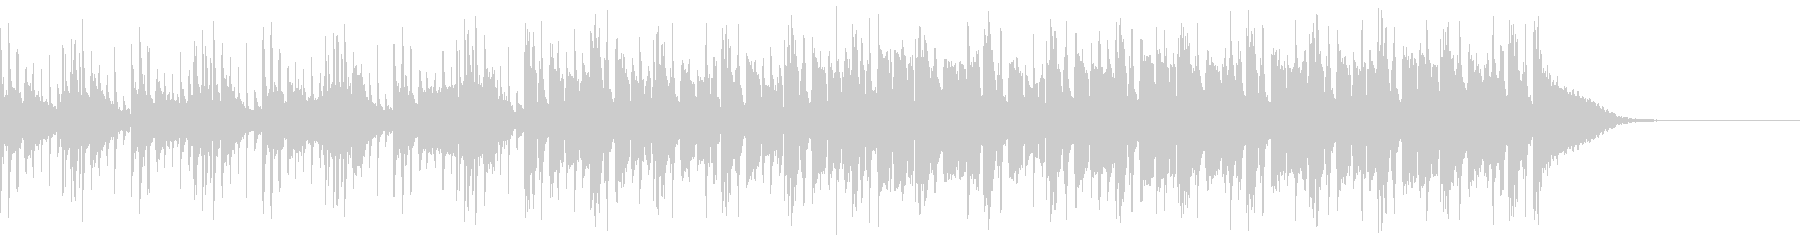 Pf「軽率」和風現代ジャズの未再生の波形